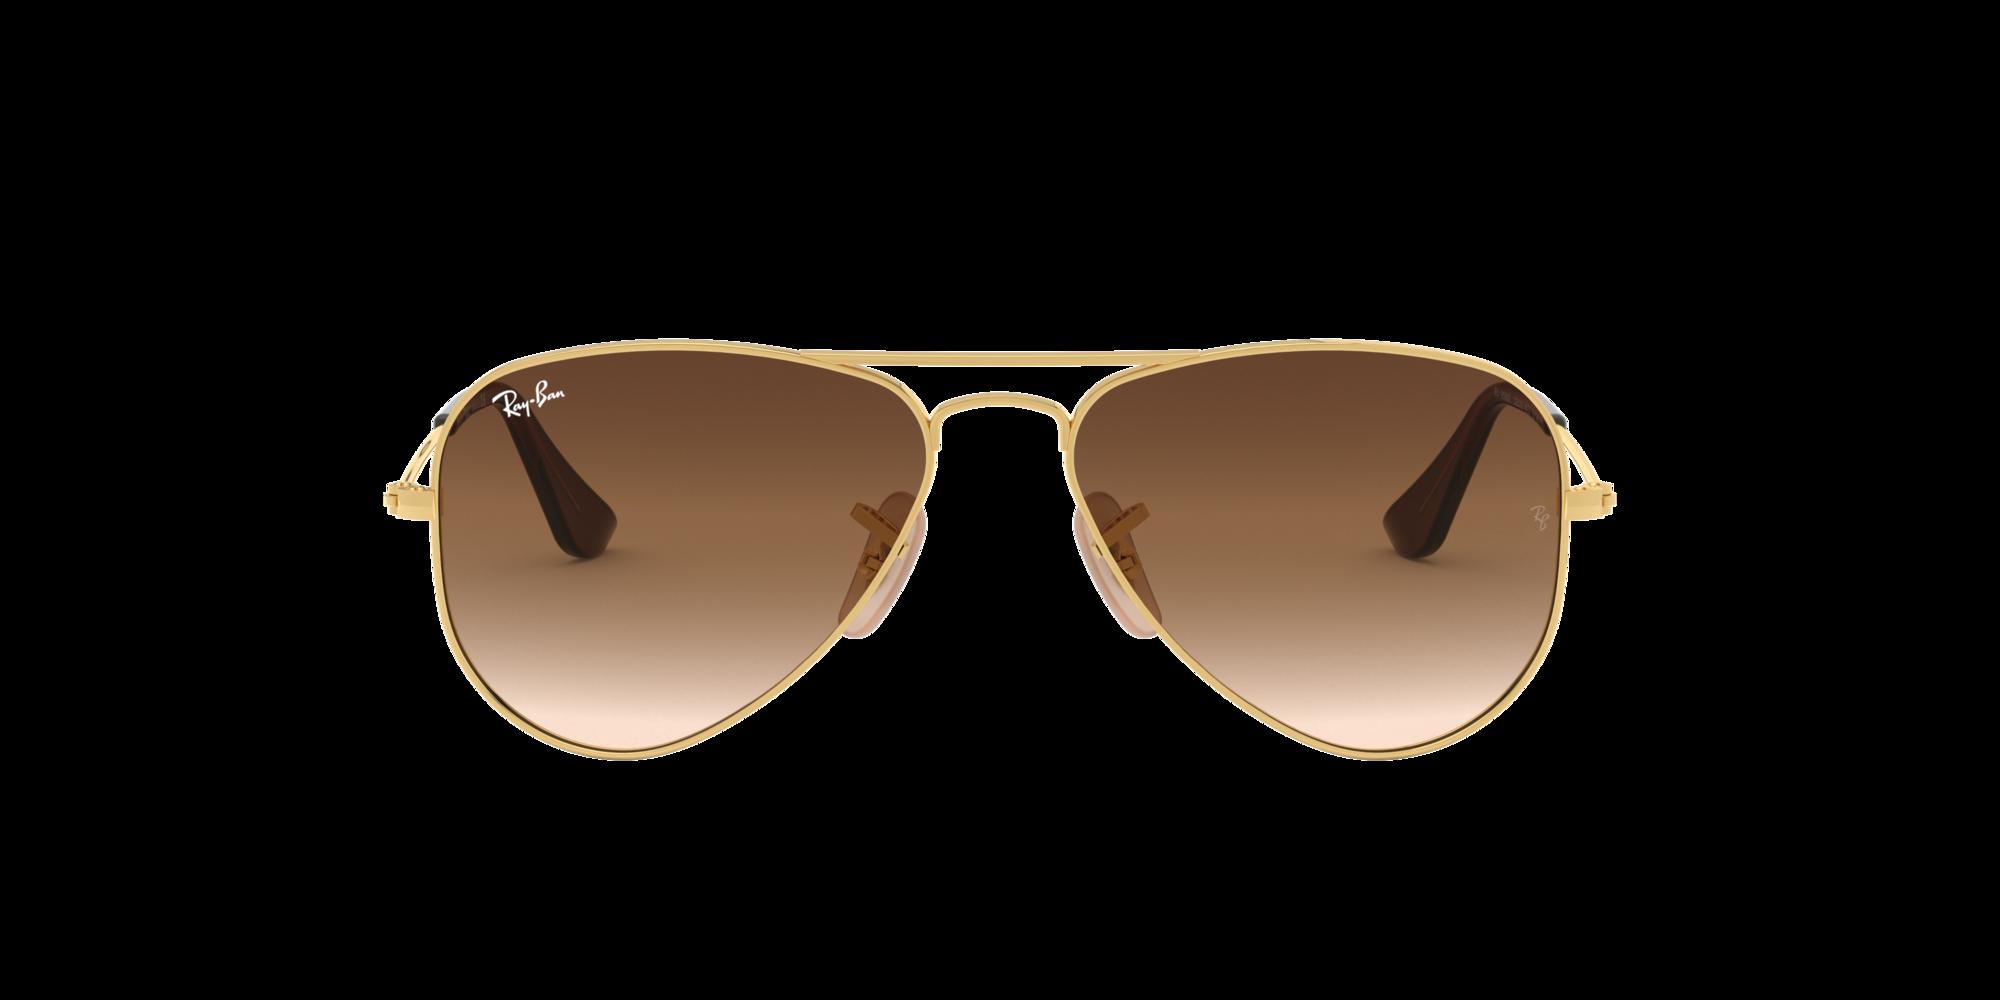 Image for RJ9506S 50 JUNIOR AVIATOR from LensCrafters   Glasses, Prescription Glasses Online, Eyewear